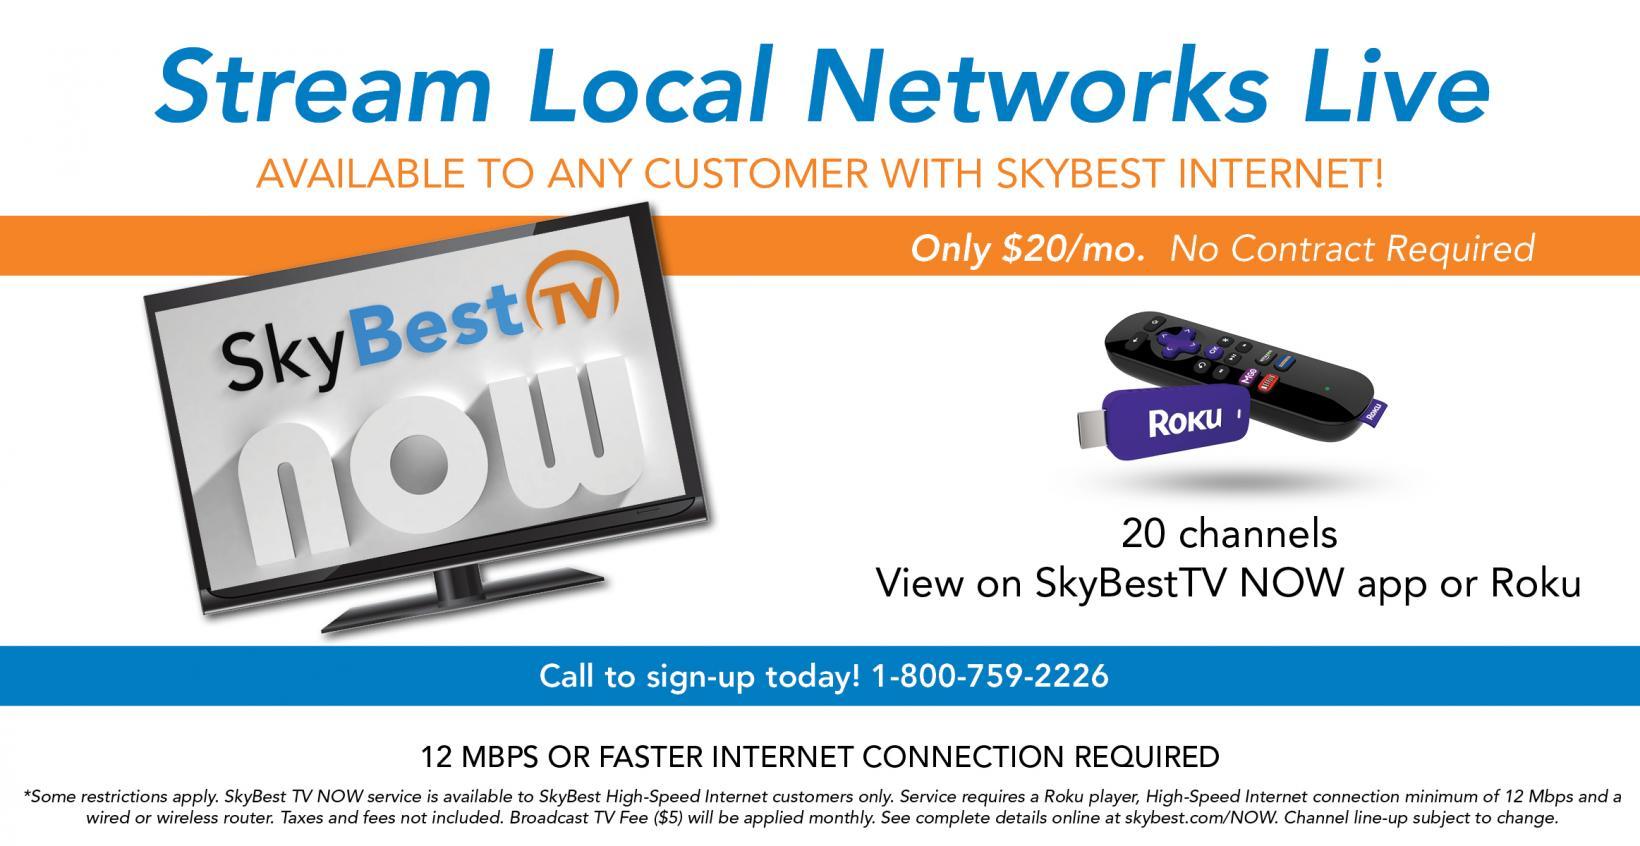 SkyBest TV NOW eBill | SkyLine/SkyBest